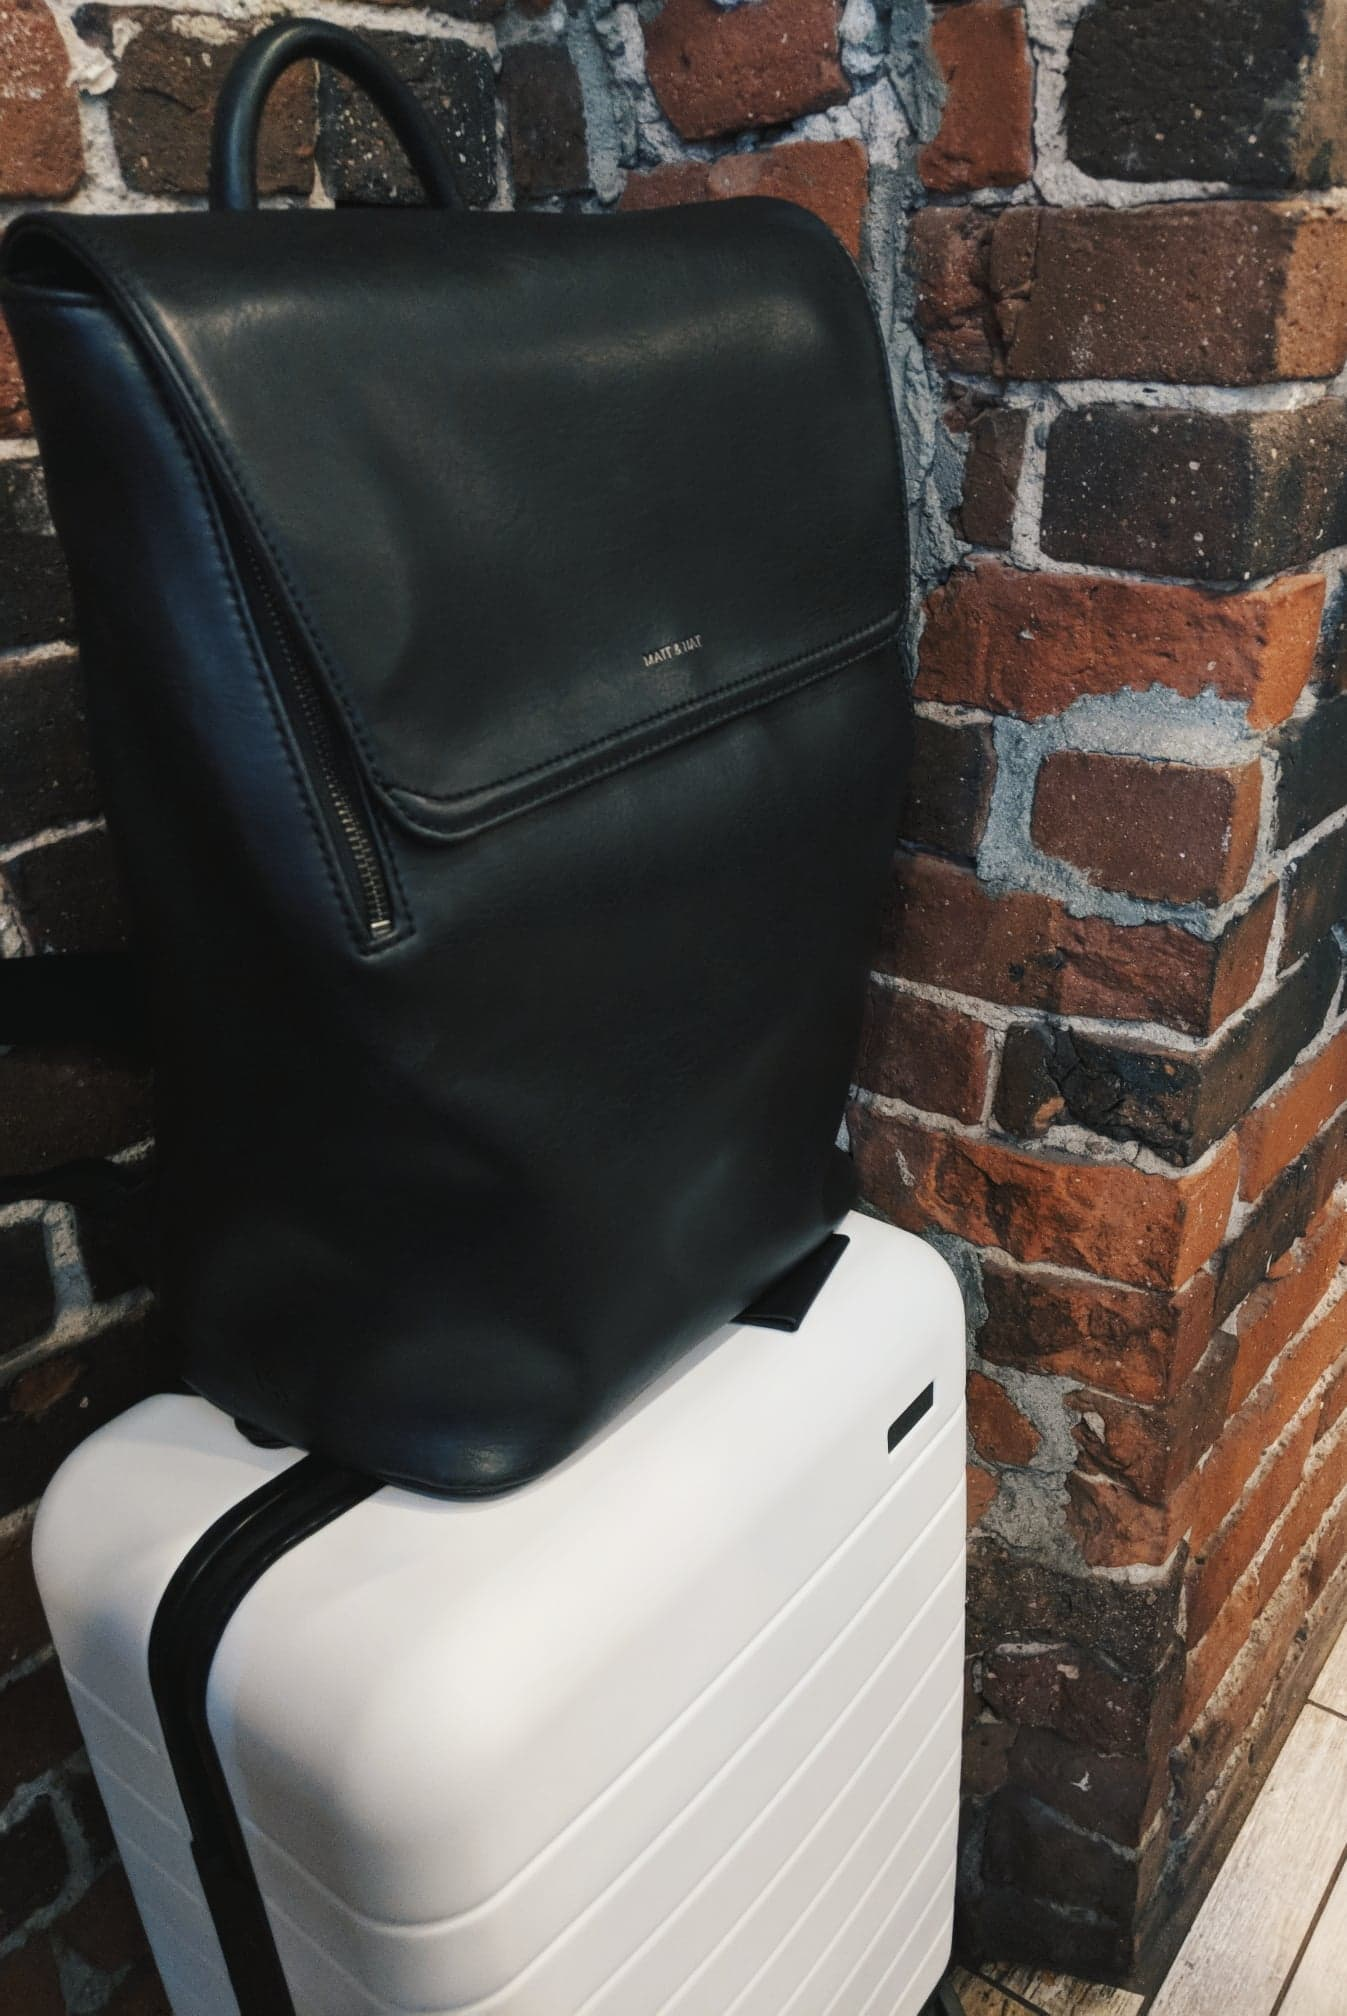 Matt + Nat Backpack and Away Suitcase | Tall Girl Meets World